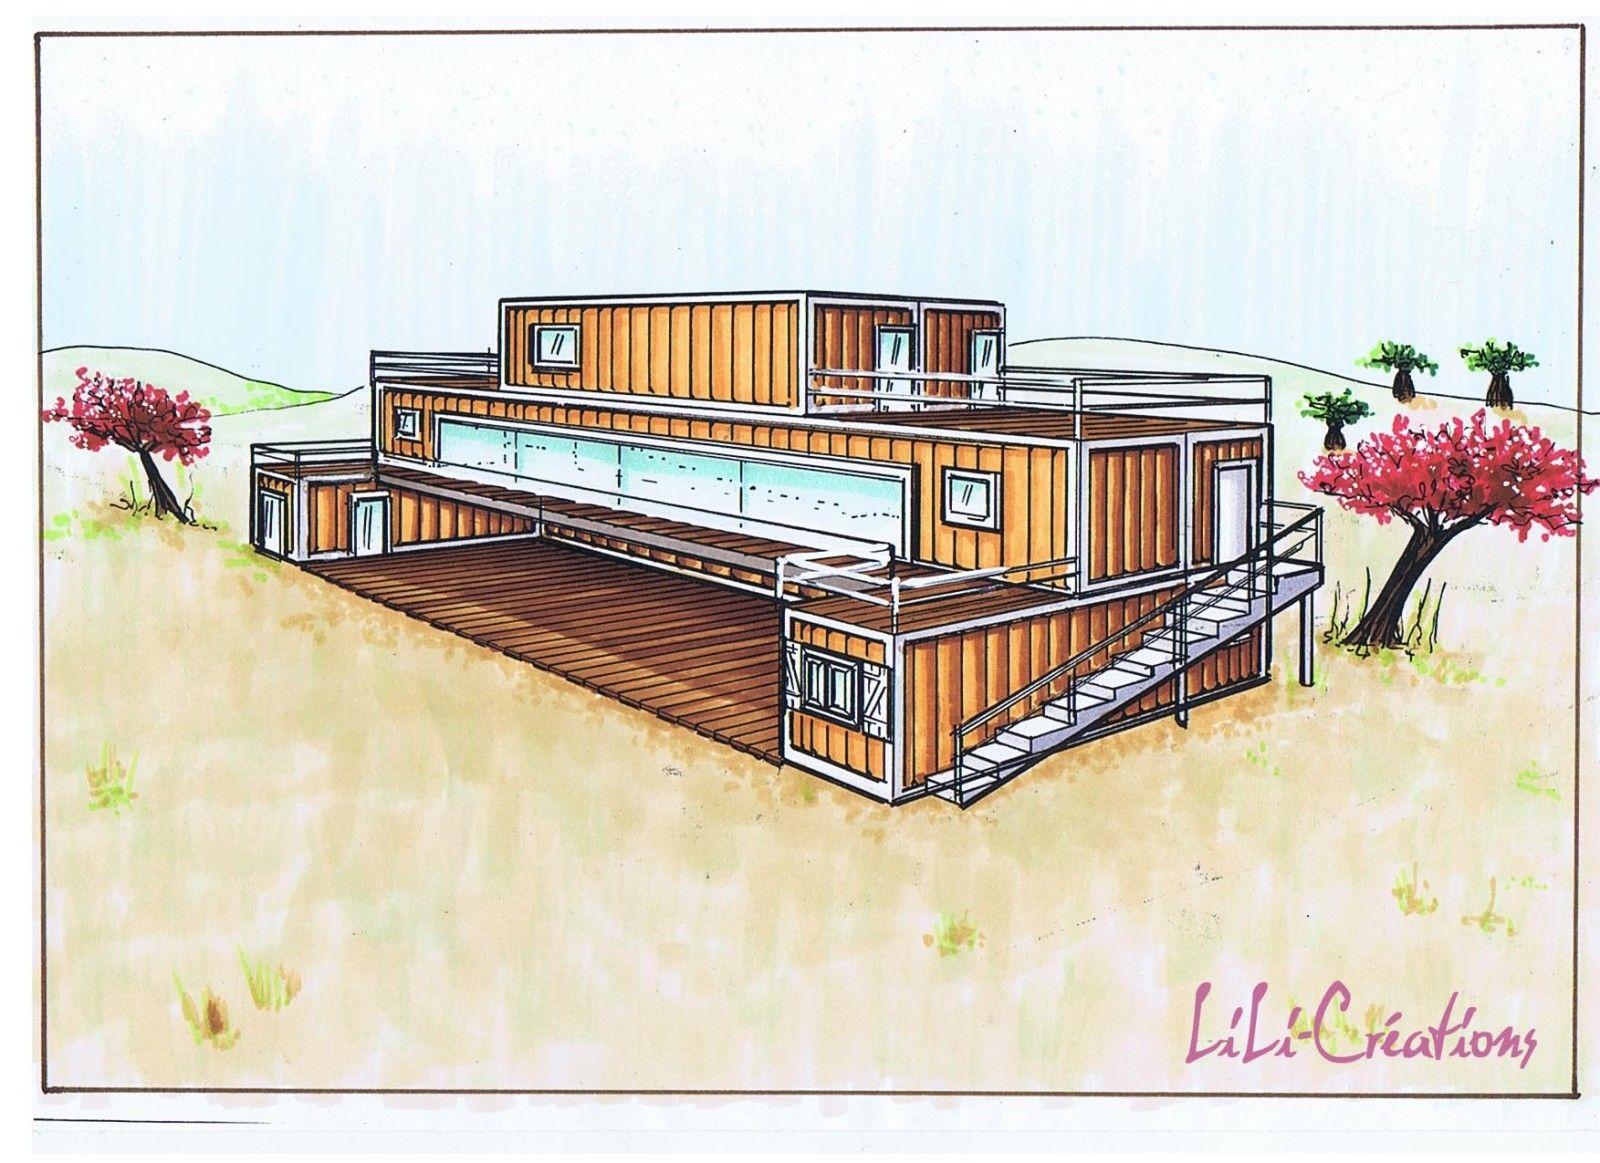 1000 images about maisons containers on pinterest shipping container pool house and shipping containers - Plan Maison Conteneur